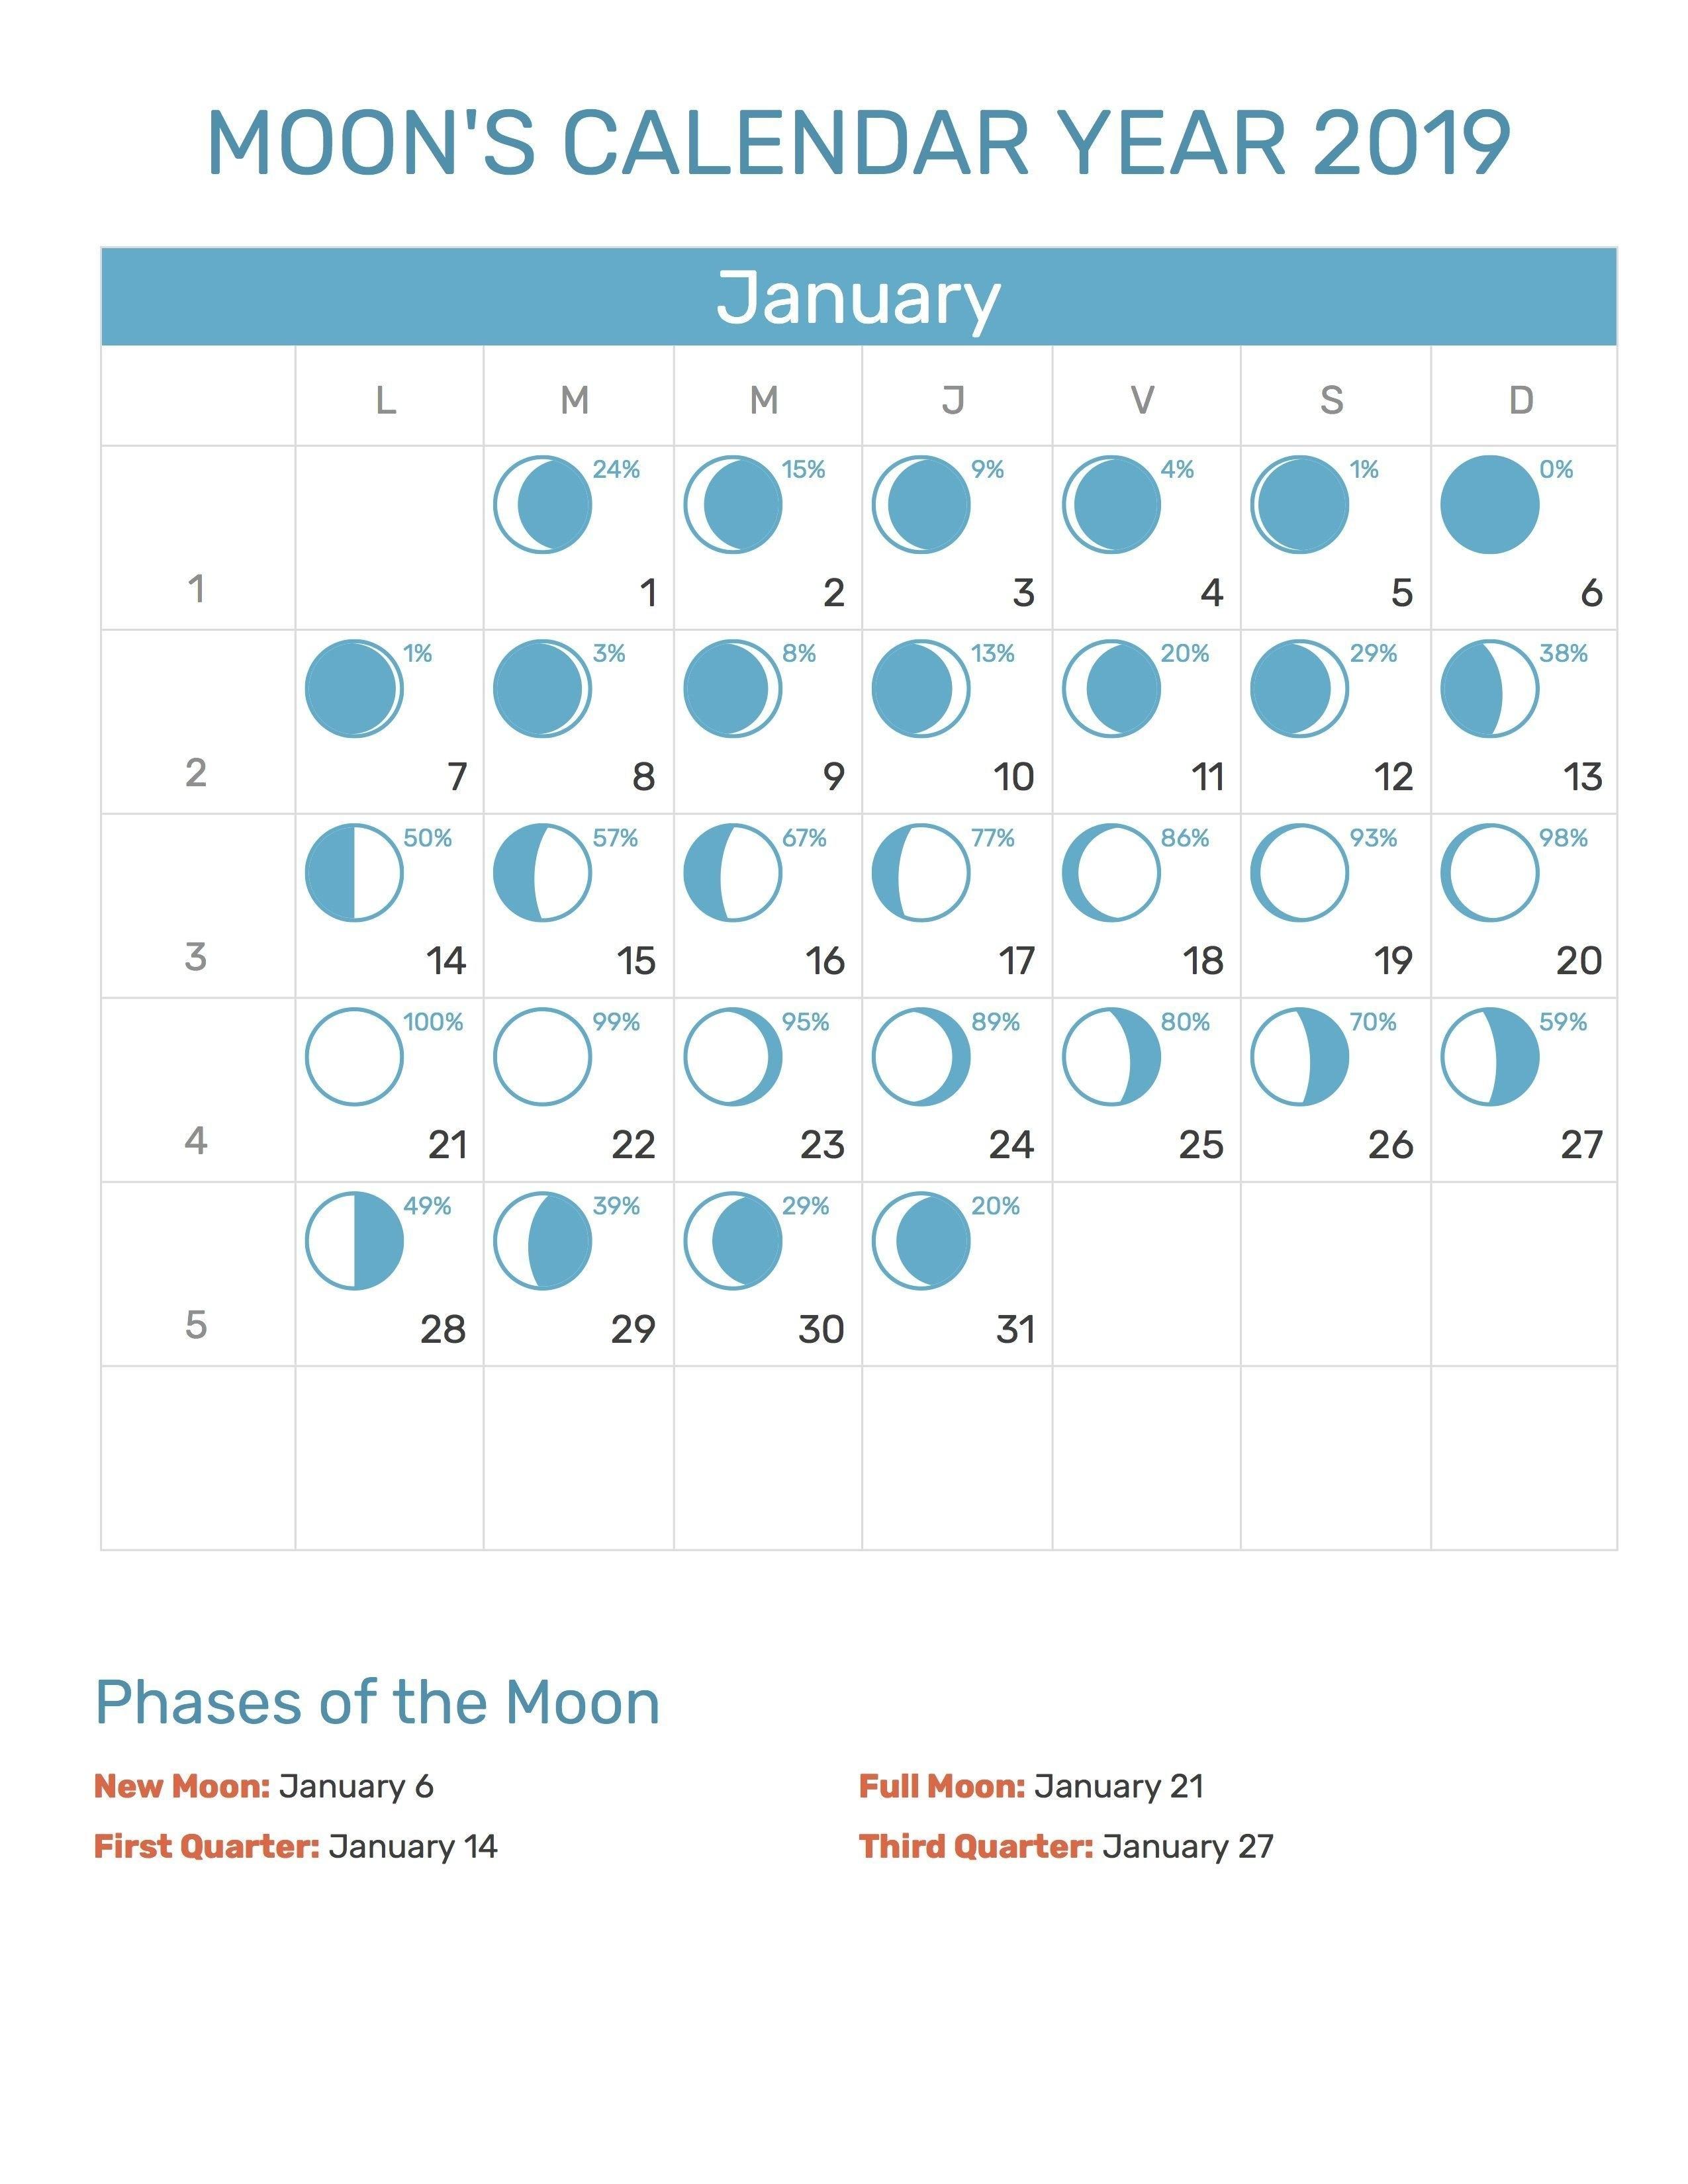 Moon Calendar 2019 January   Moon Calendar   Moon Calendar, Calendar Lunar Calendar 2019 Zodiac